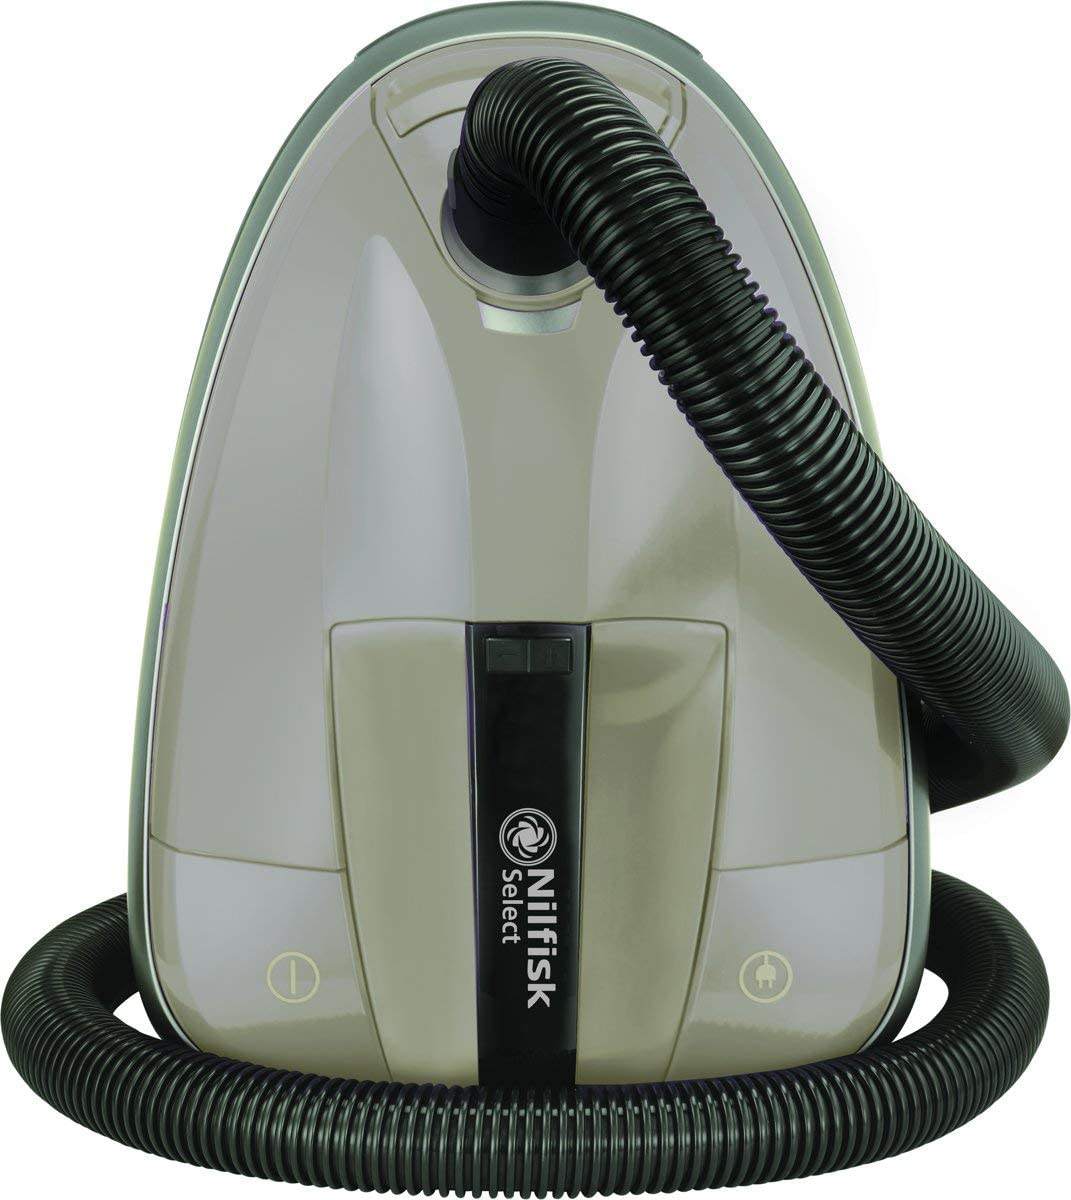 Nilfisk GRCL13P8A1 Aspirador Select GRCL1P08A1 650W(128350614, 270 ...